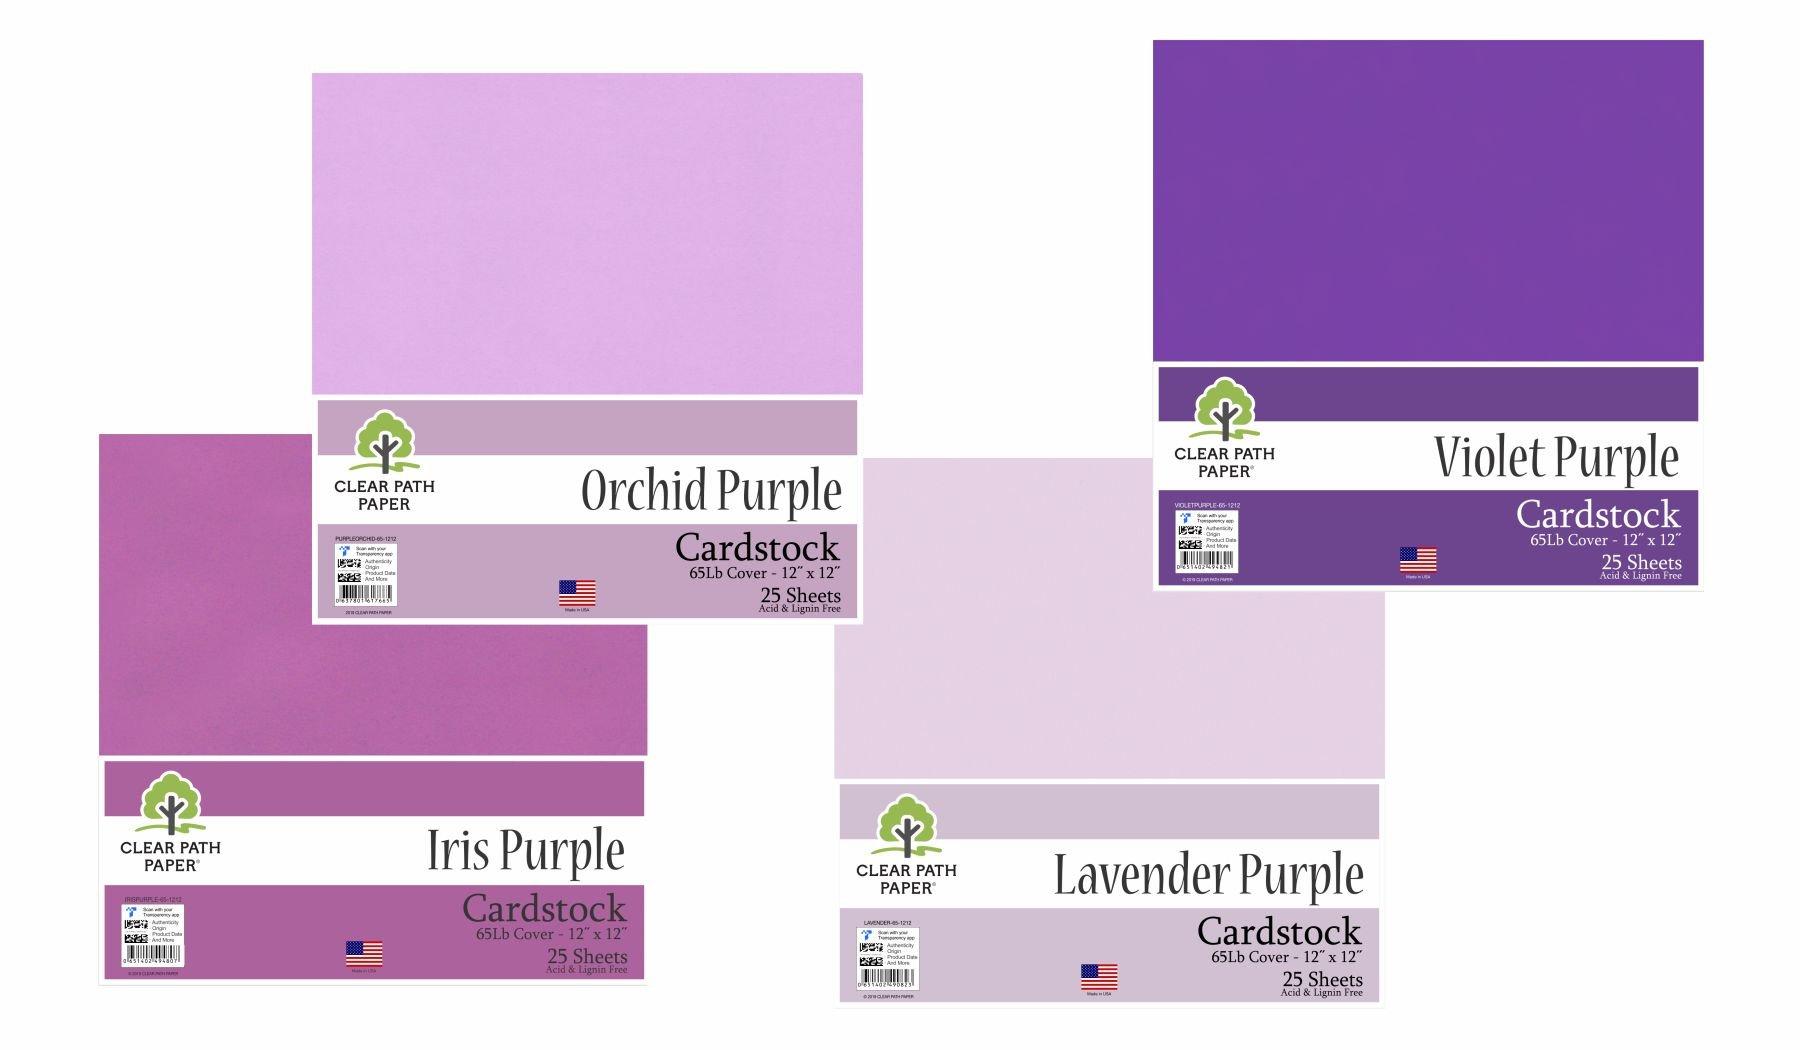 Image of the Lavender Purple / Orchid Purple / Iris Purple / Violet Purple Bundle